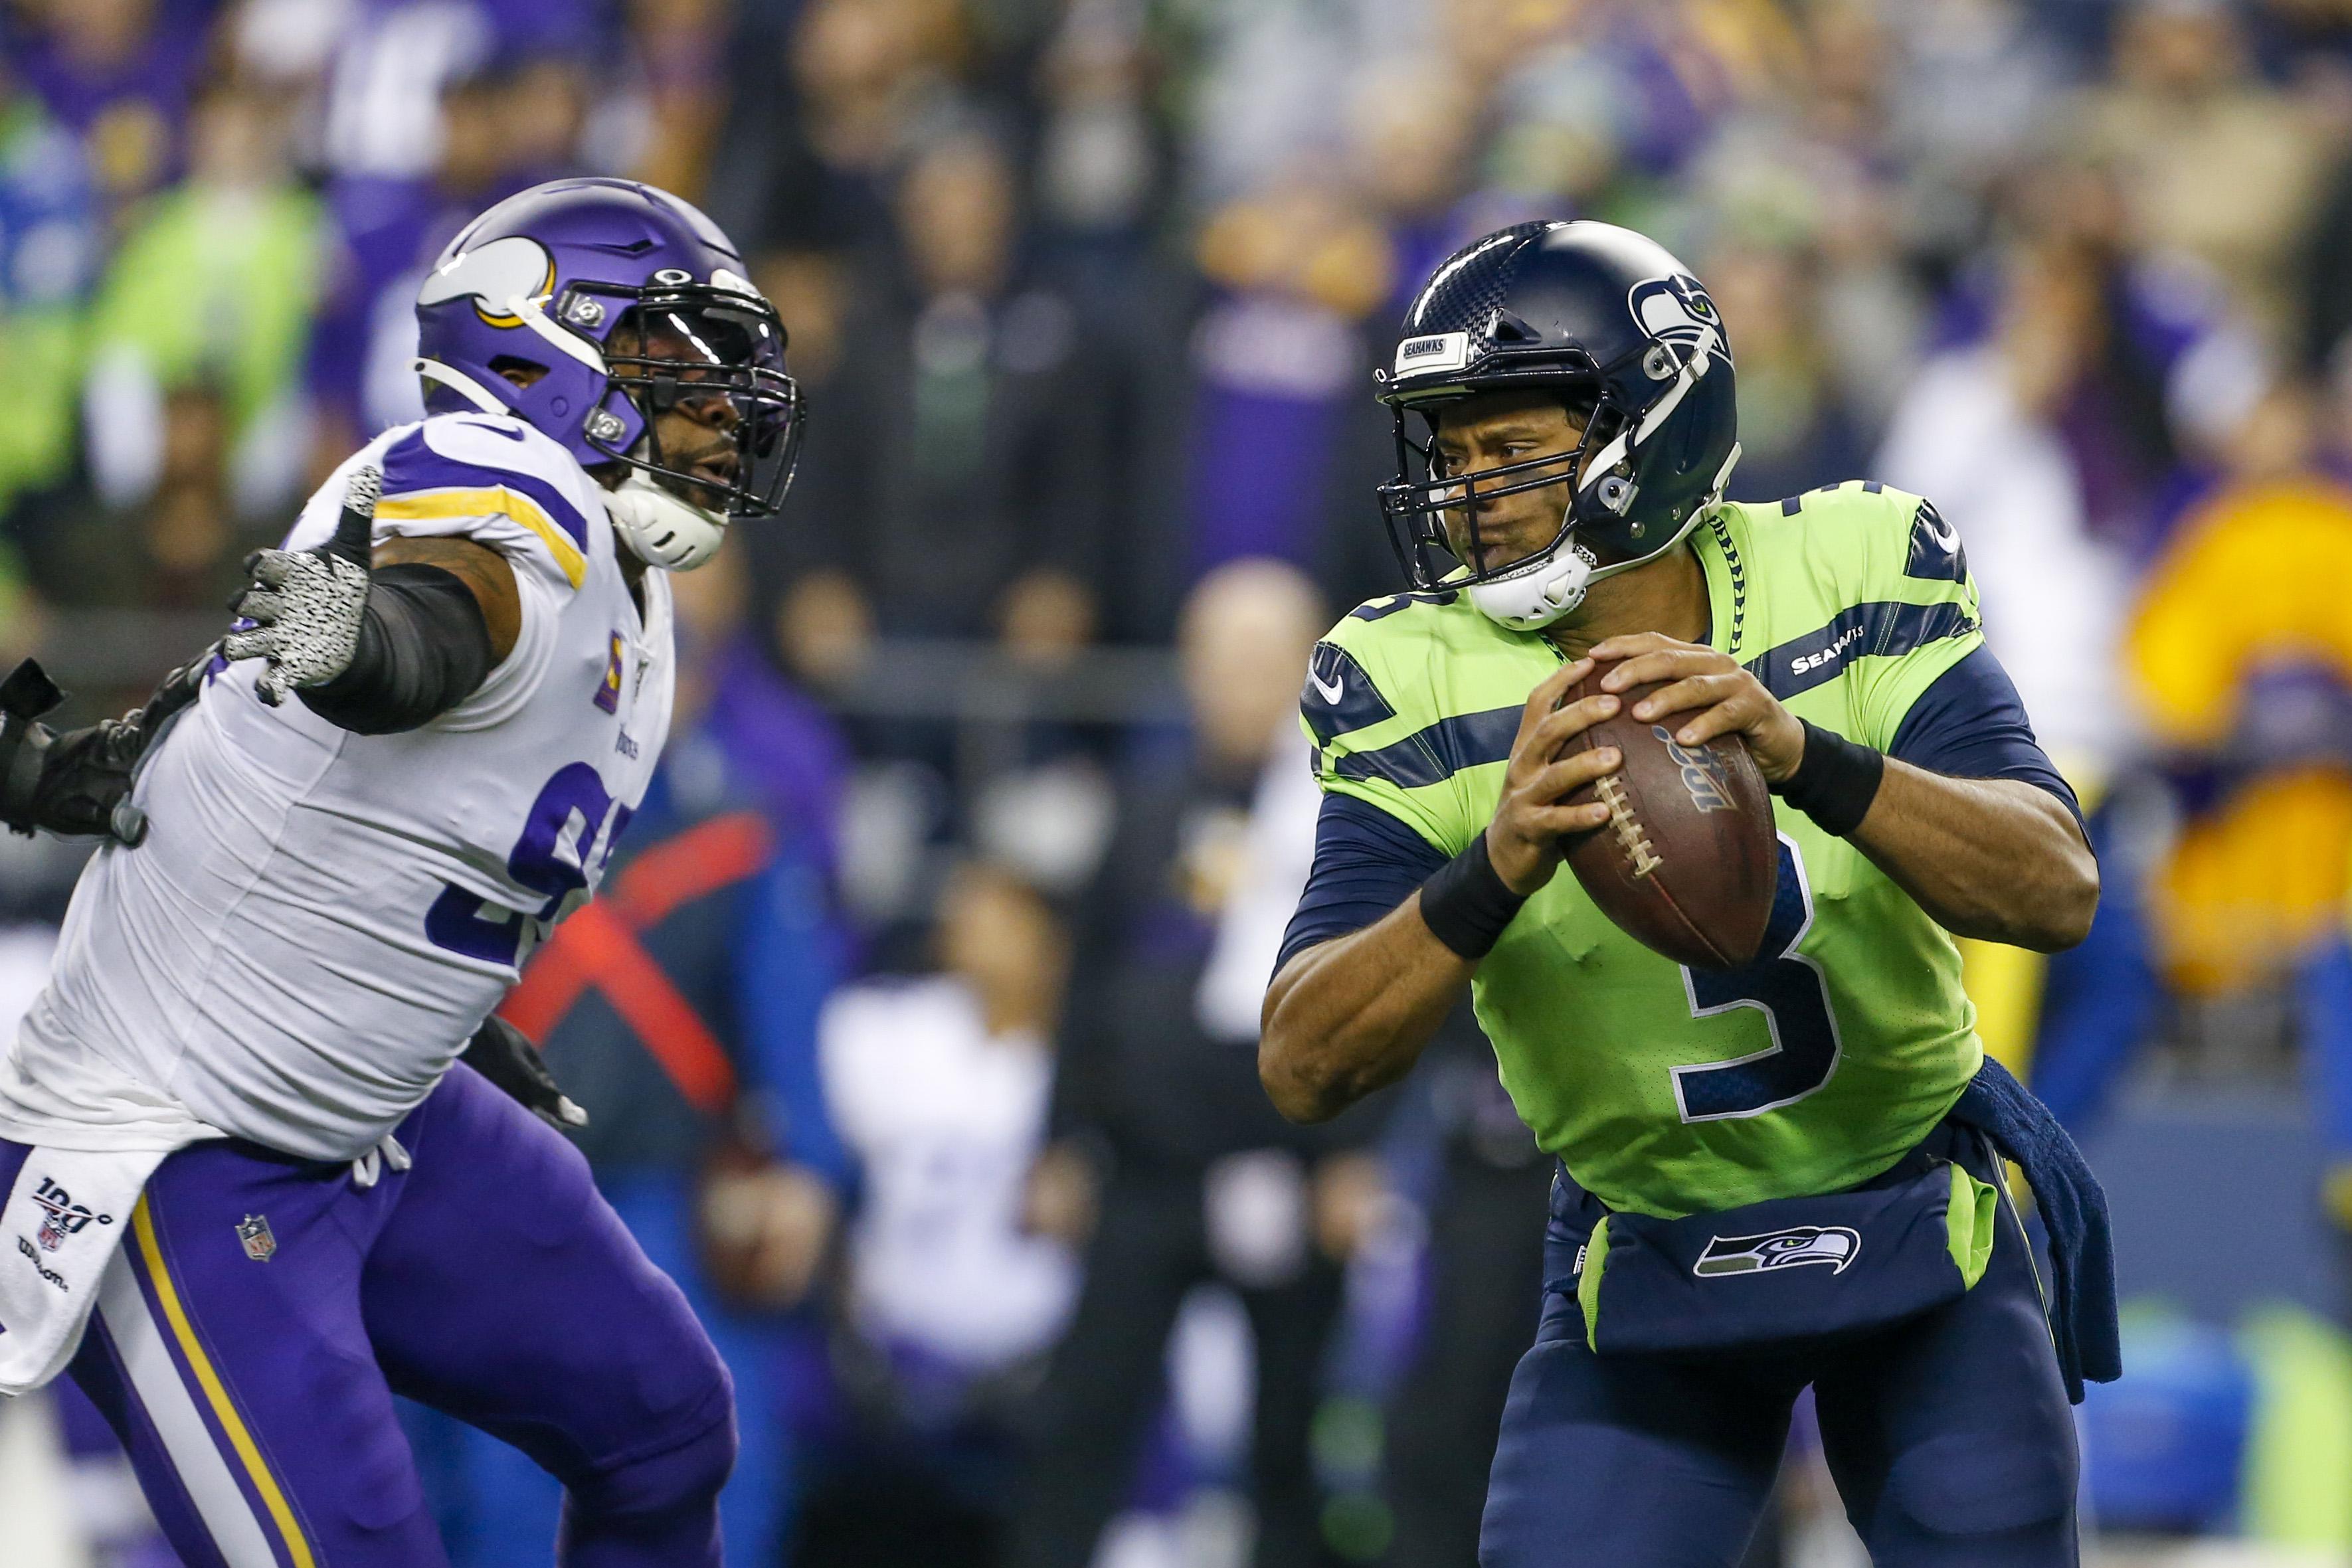 Will Seahawks Show Interest in Veteran DE Everson Griffen?